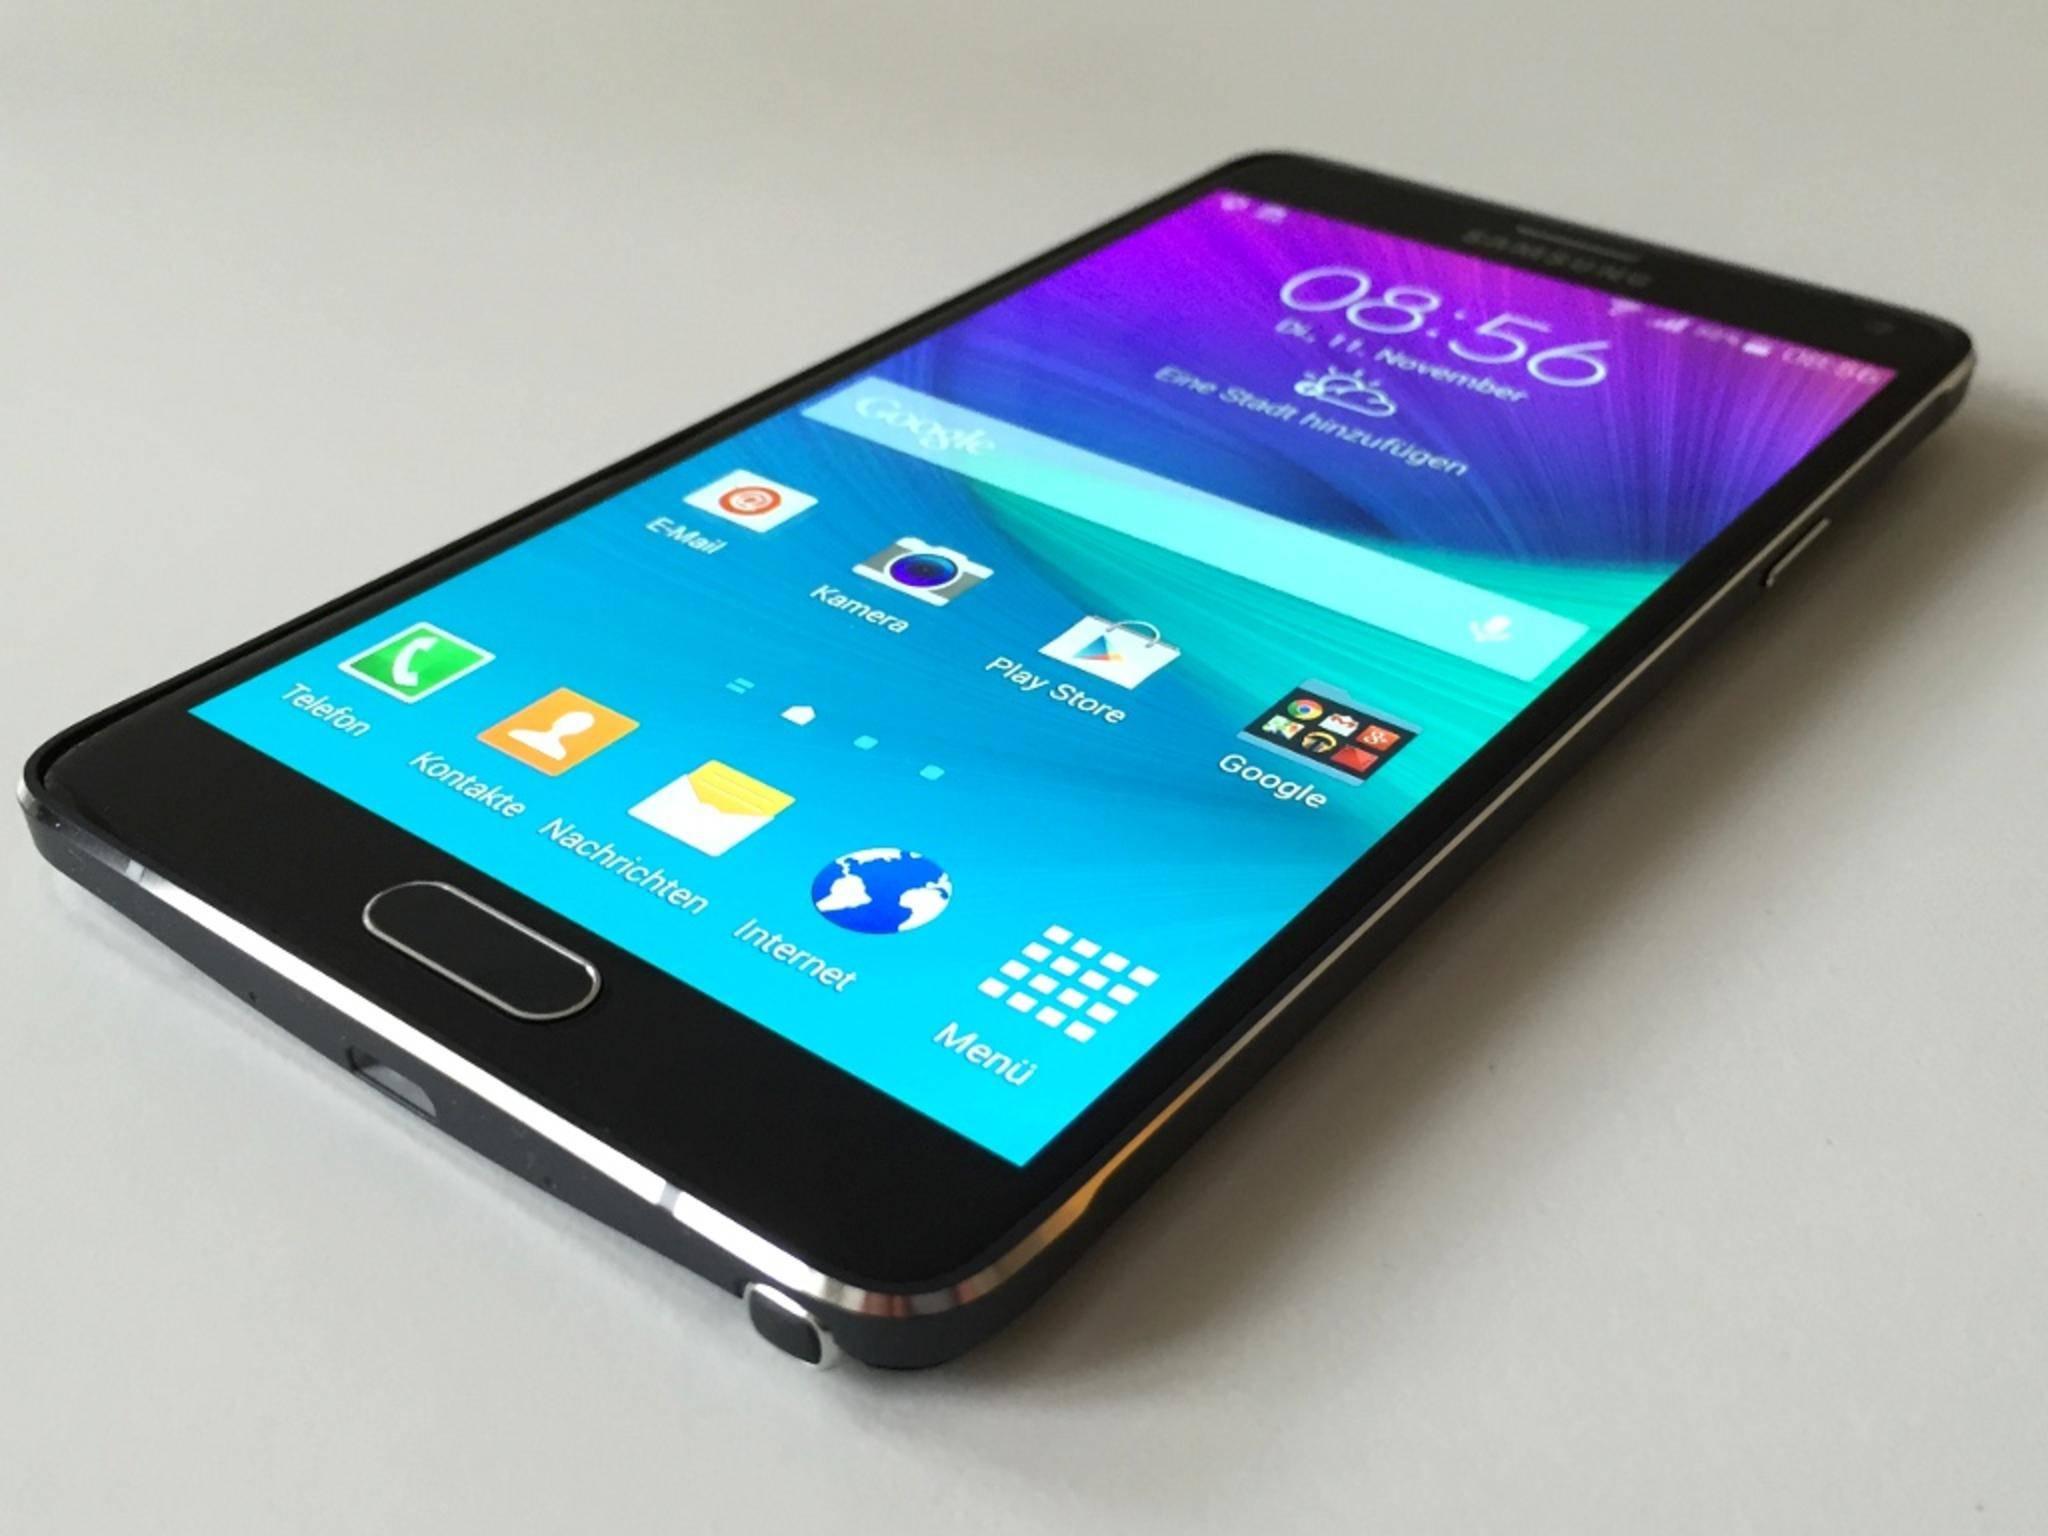 Samsung Galaxy note 4 11